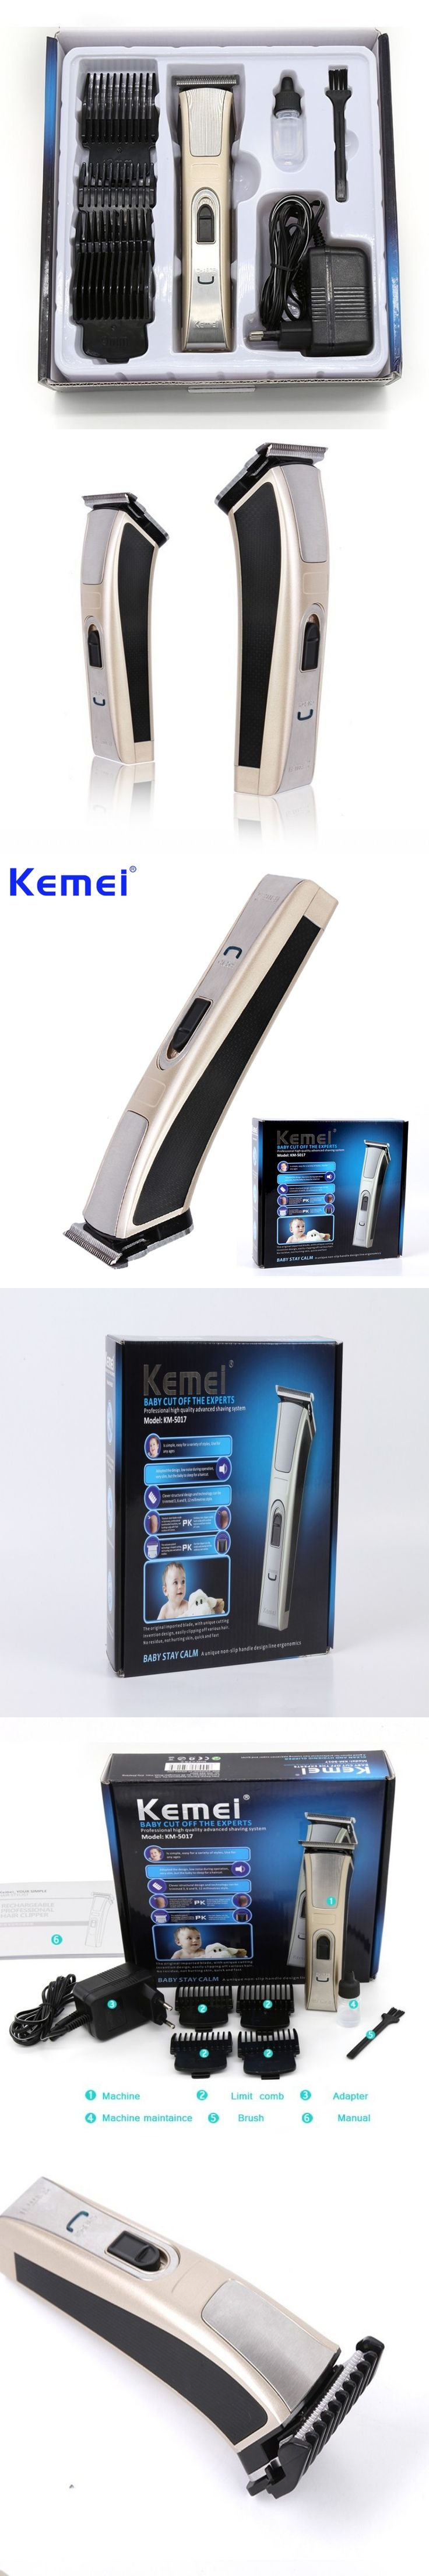 KEMEI High-Power Electric Man Baby Hair Clipper Trimmer Mute Safe Rechargeable Hair Cutting Machine aparador de barba BT-105